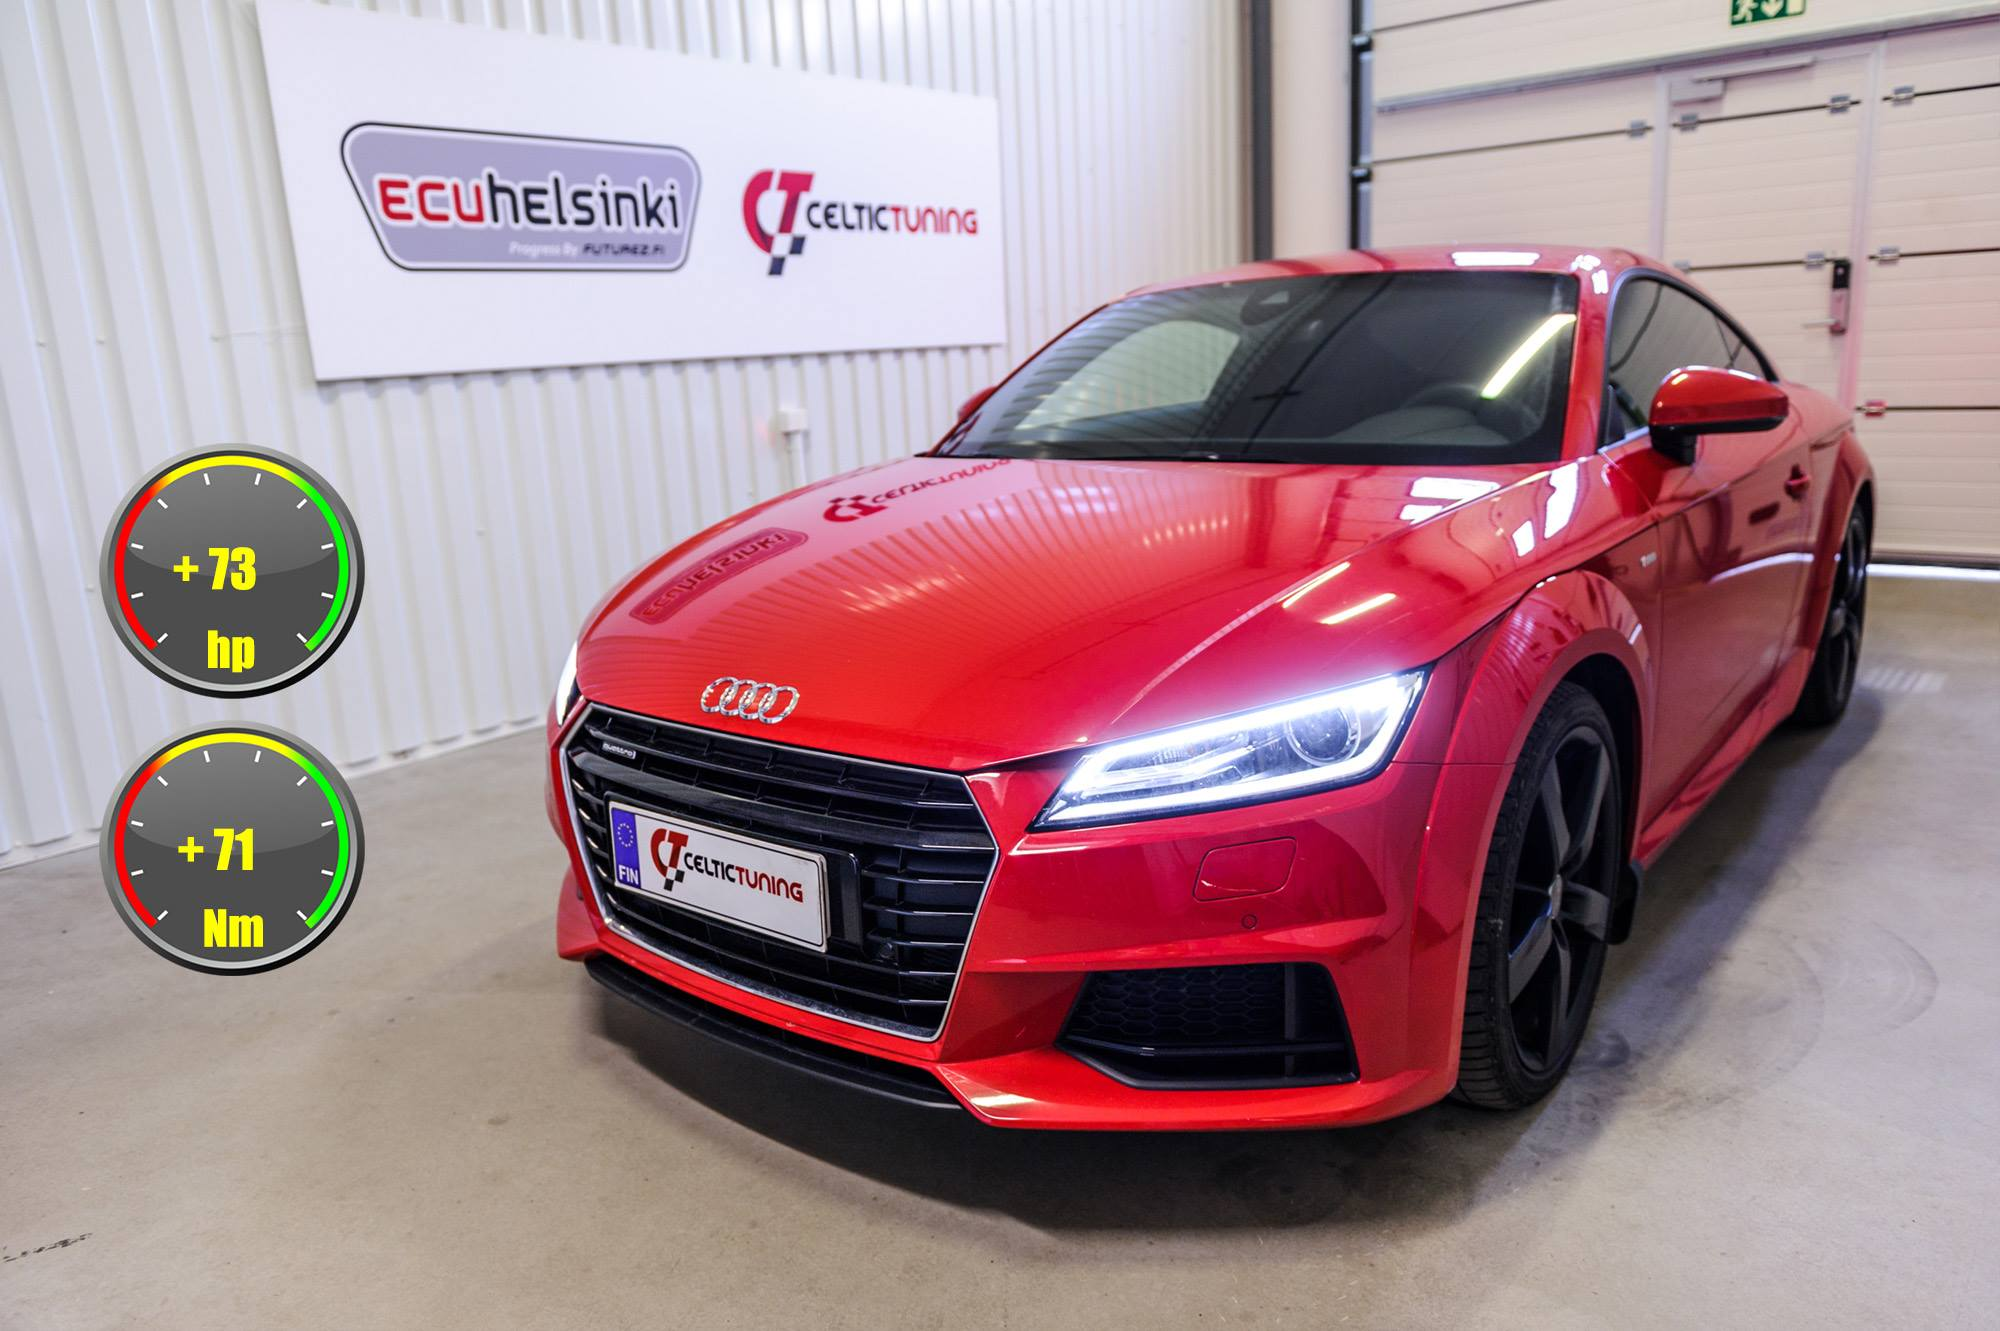 Audi TT Lastutus celtic tuning